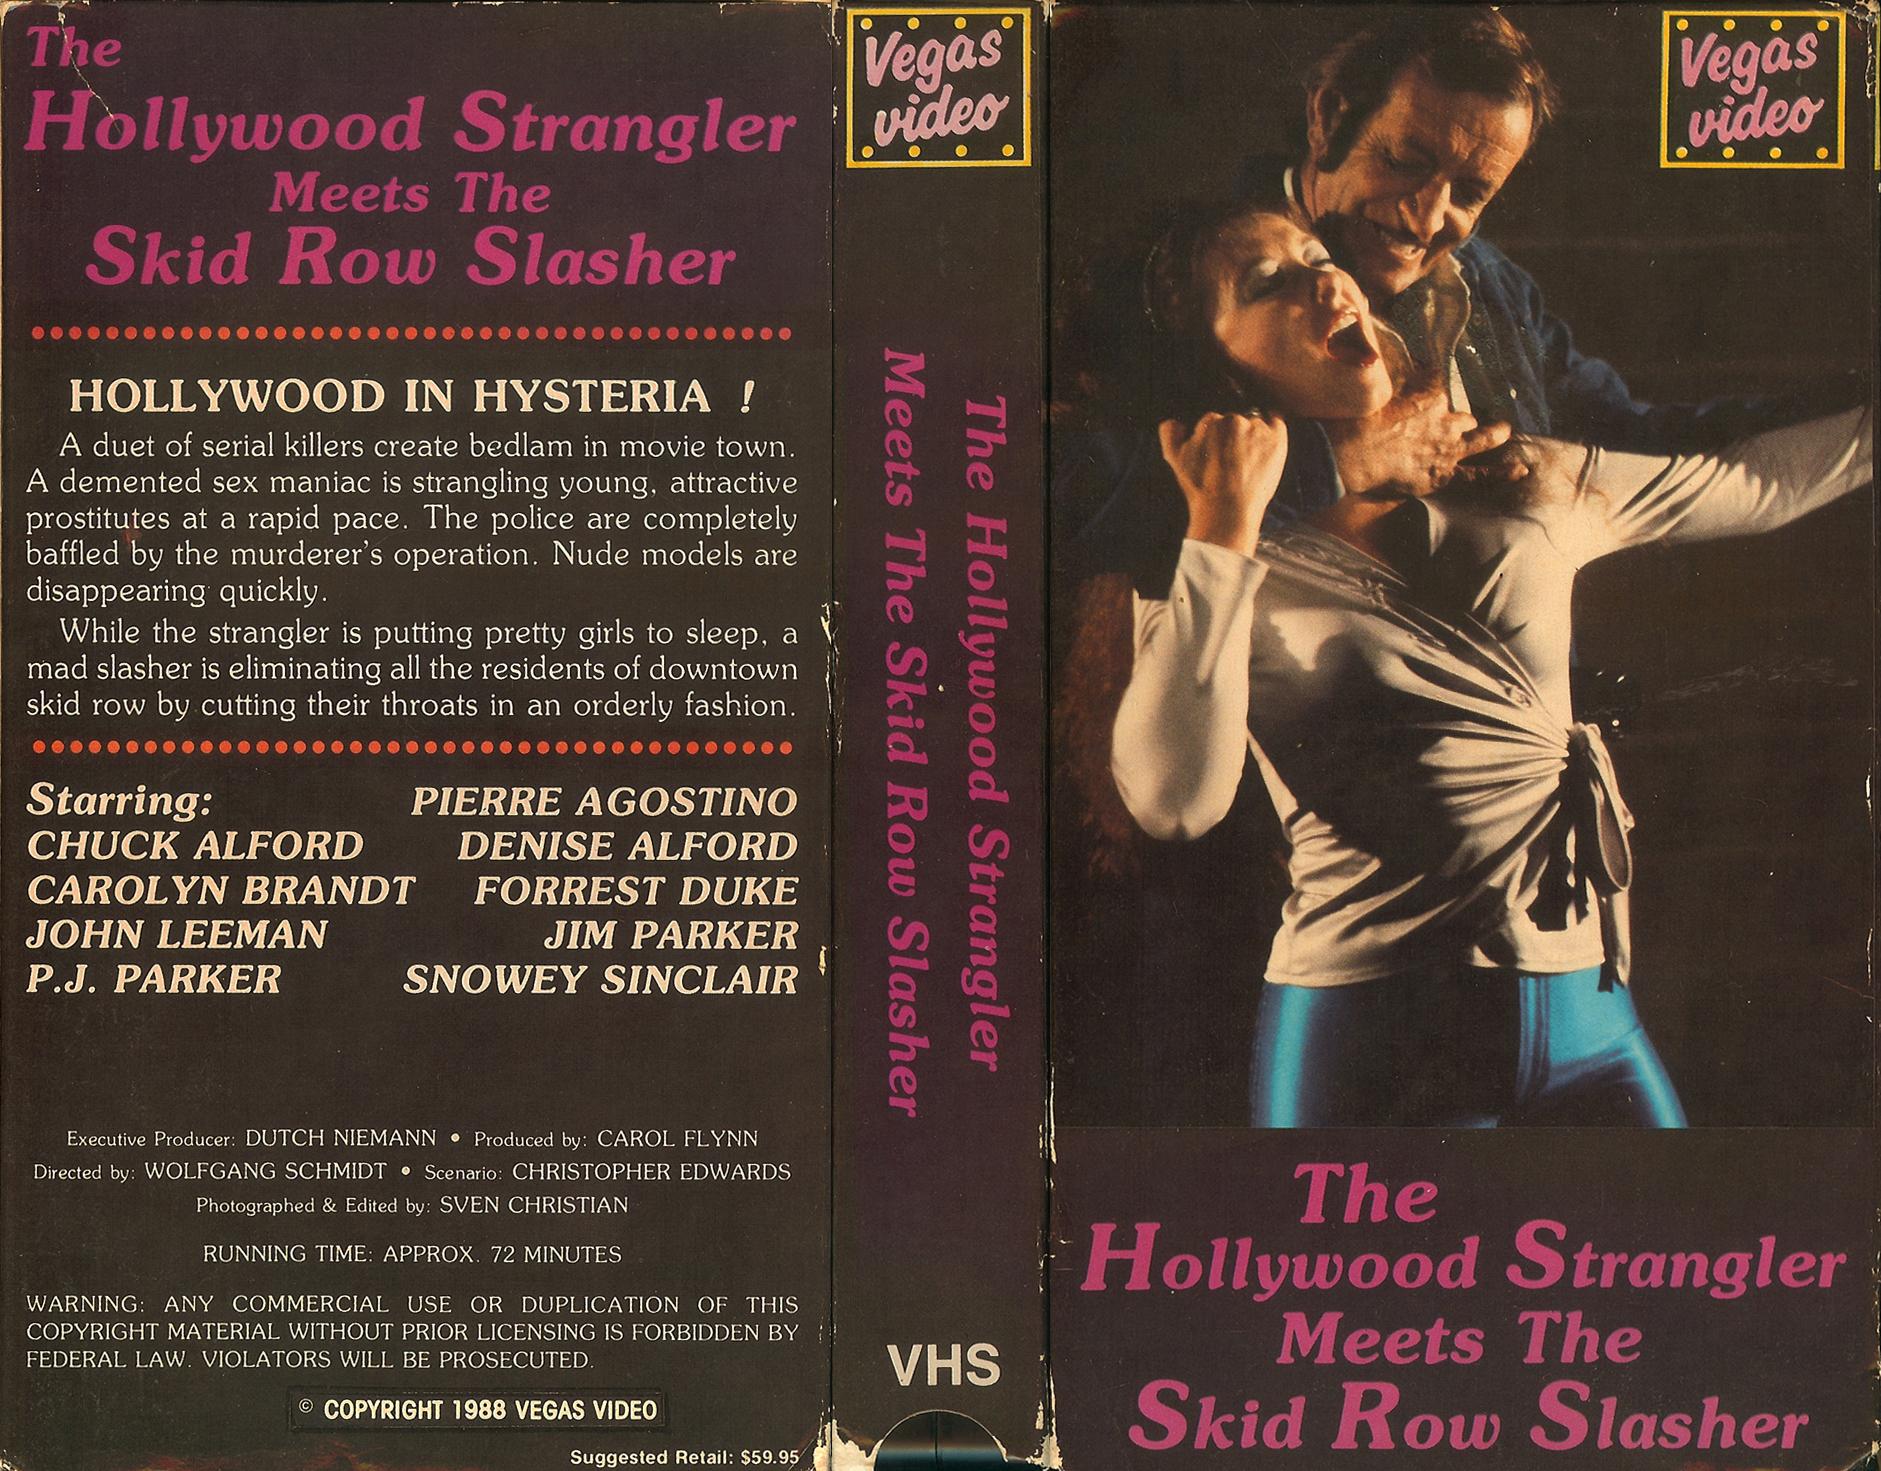 The Hollywood Strangler Meets the Skid Row Slasher movie